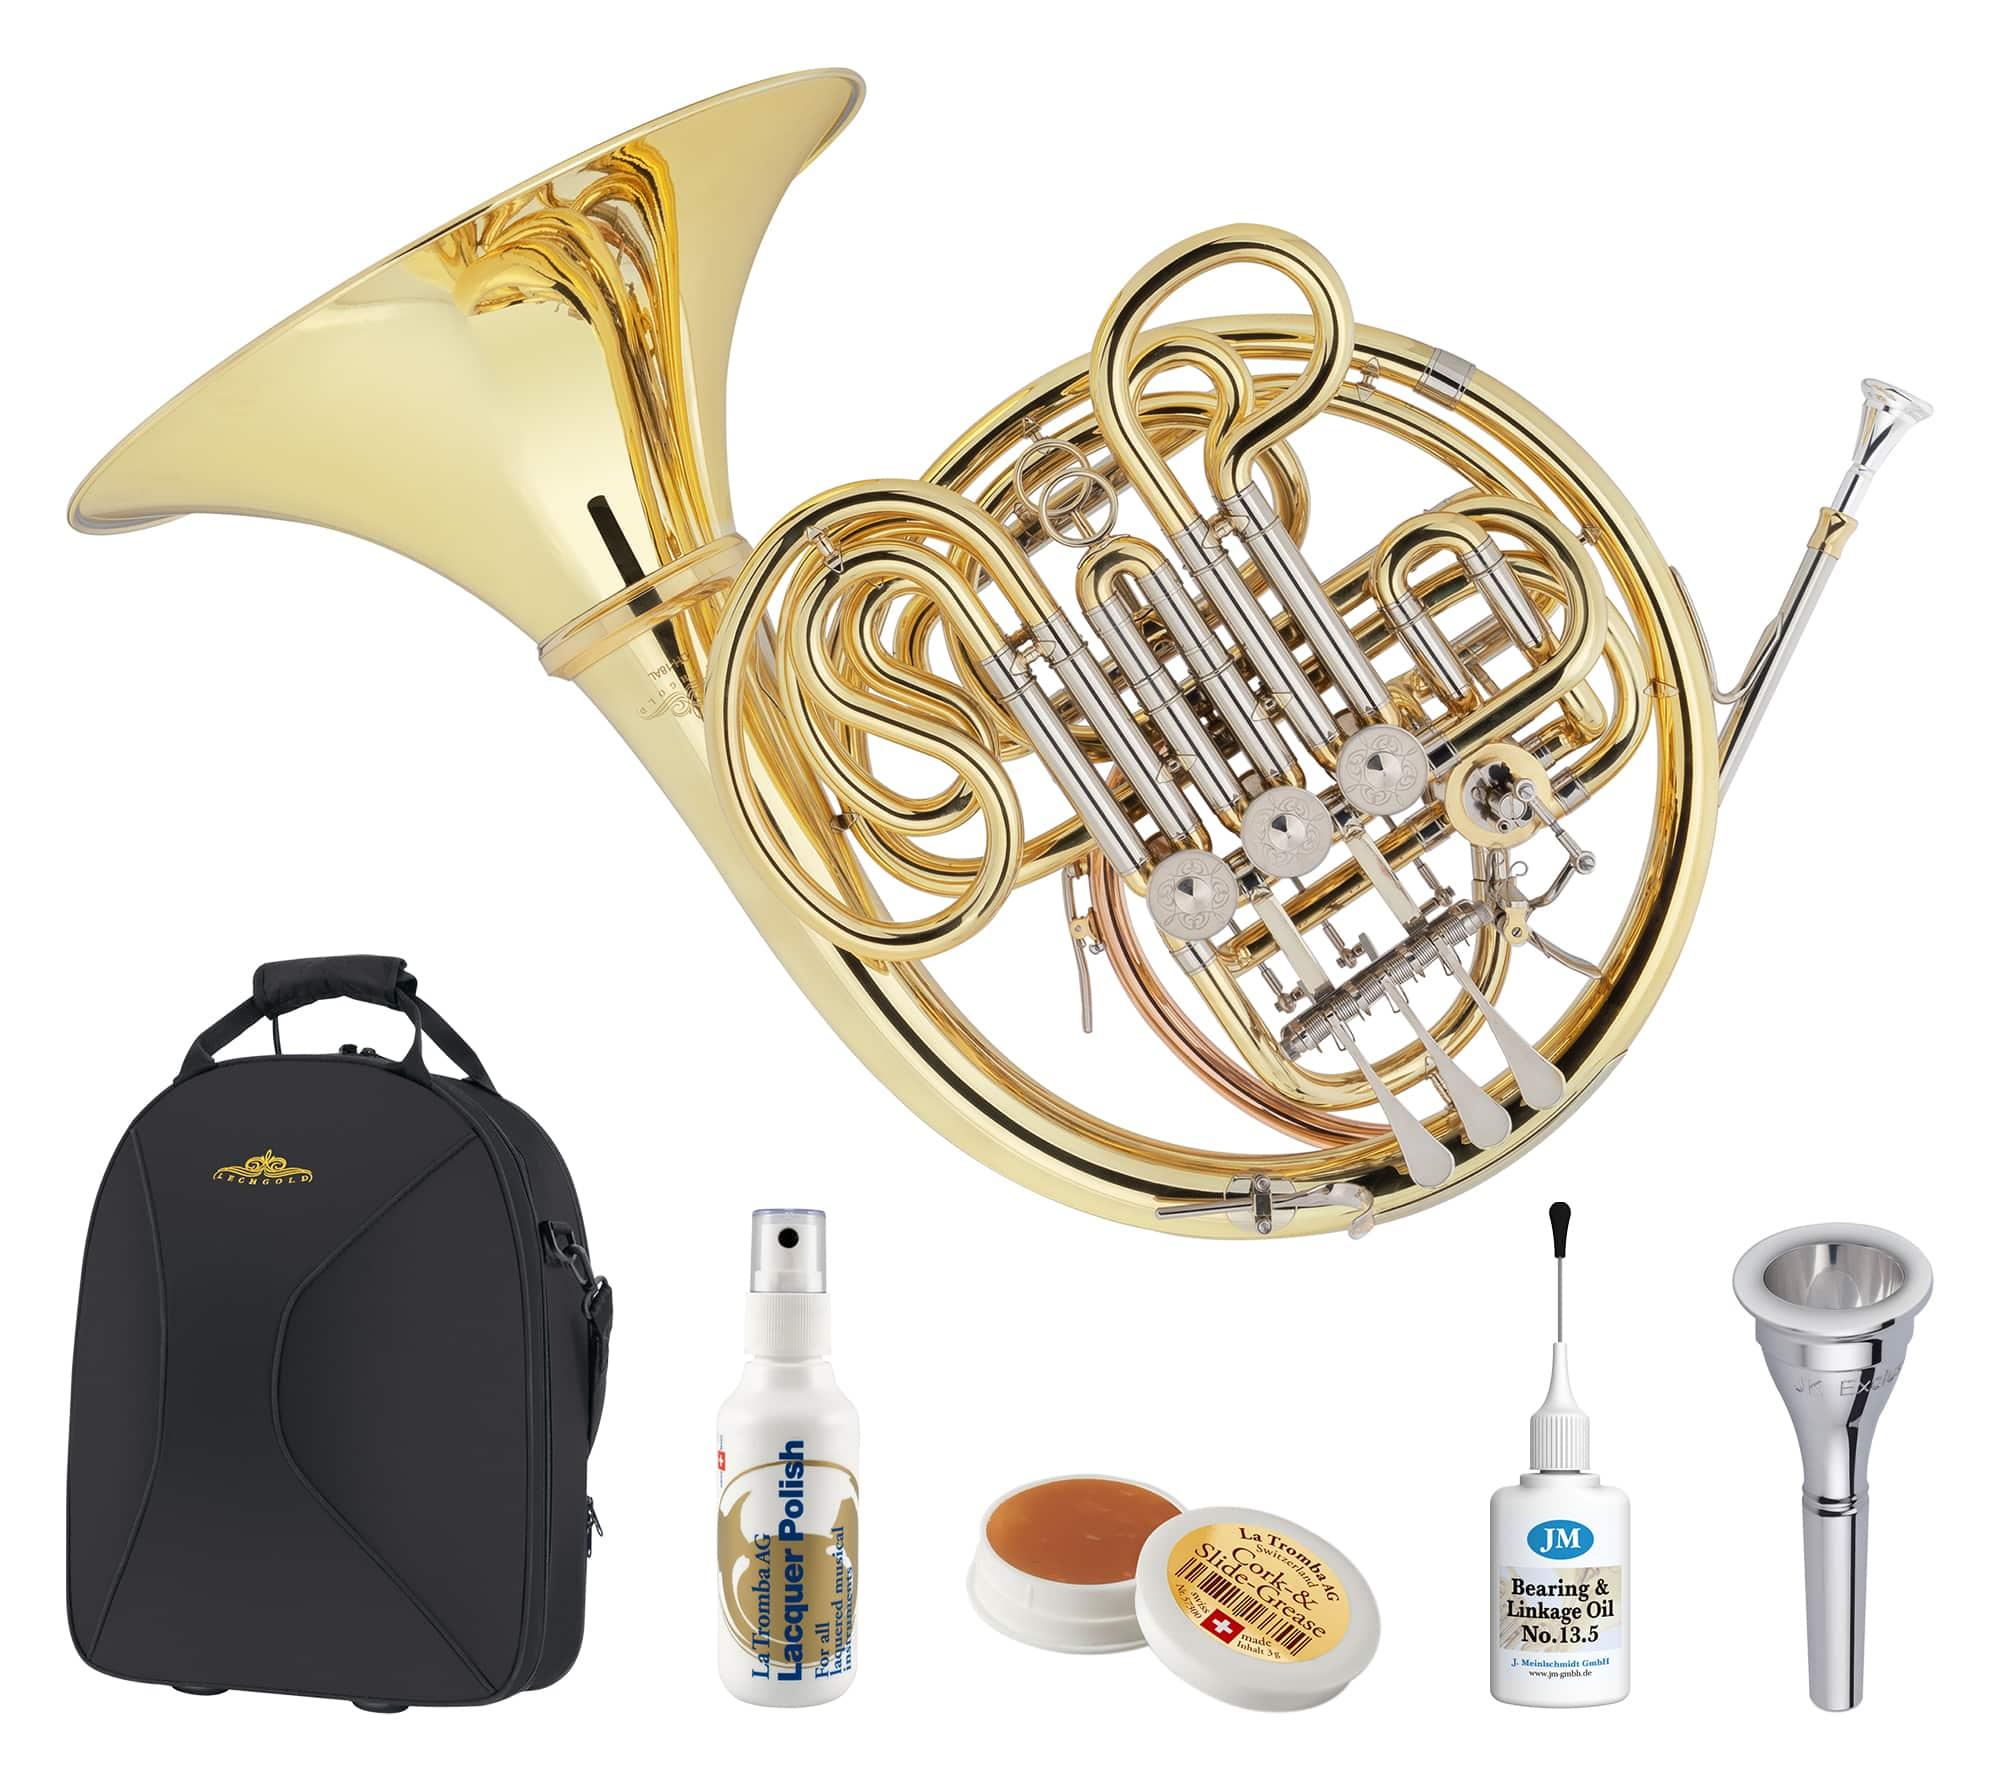 Hoerner - Lechgold DH 18AL Doppelhorn Deluxe Set - Onlineshop Musikhaus Kirstein